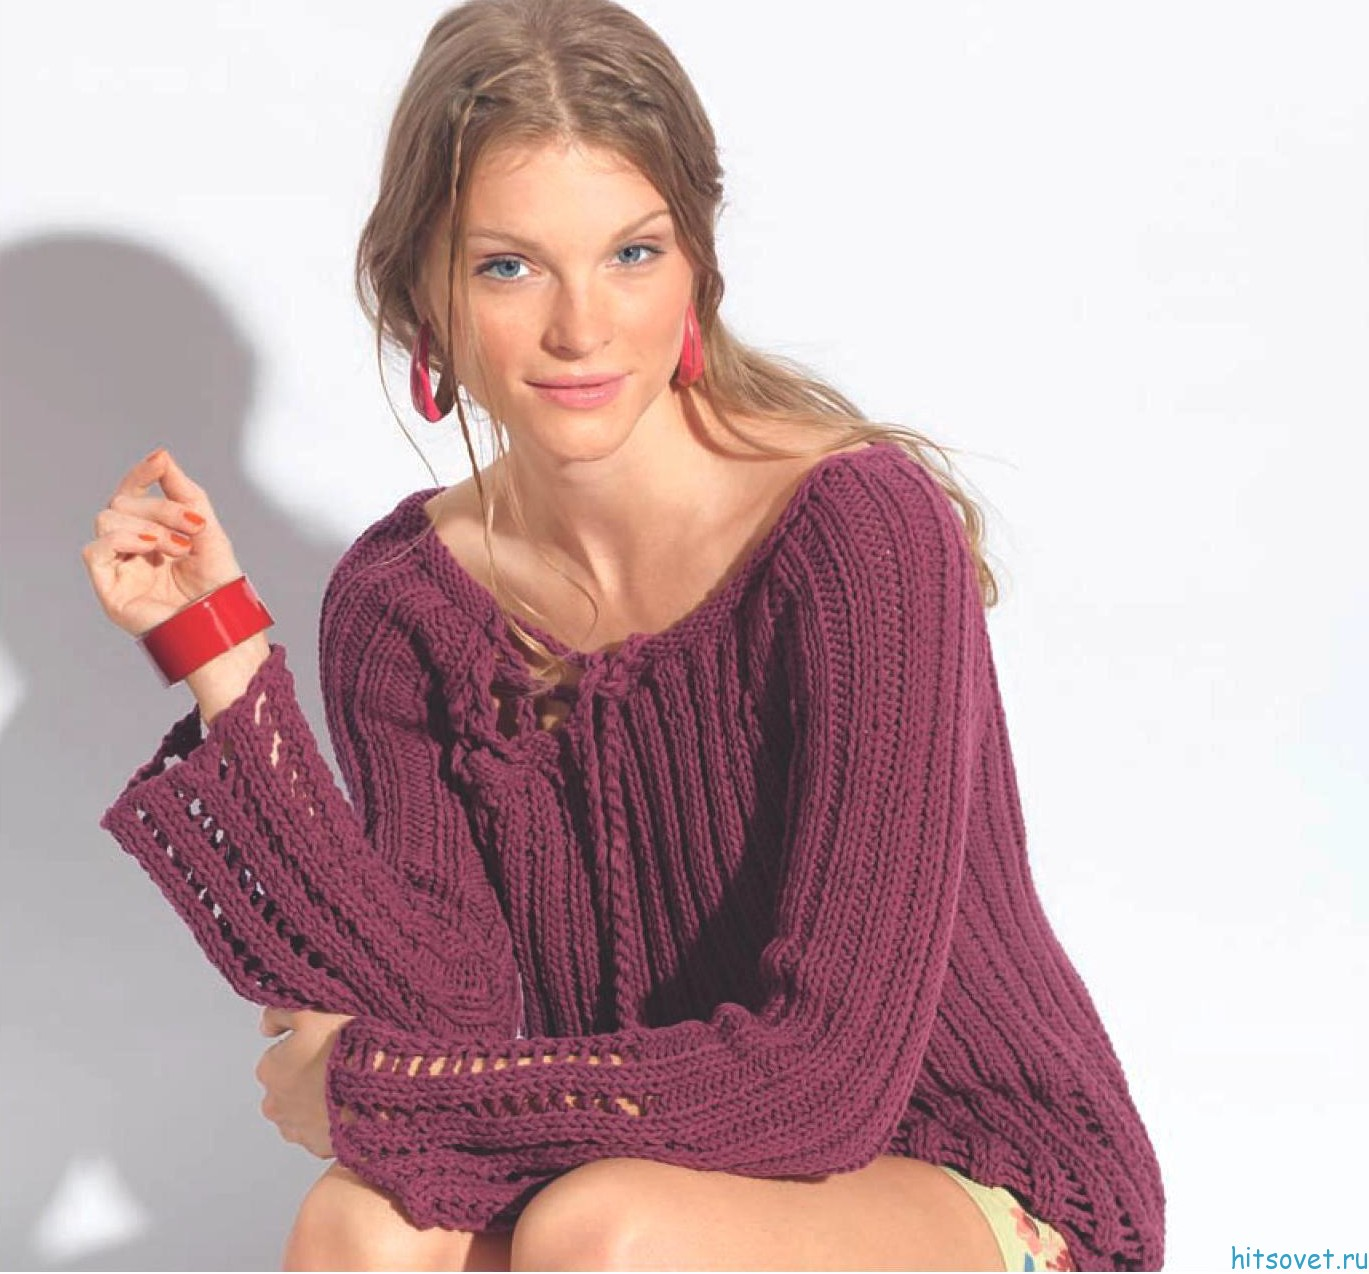 pulover_so_shnurom